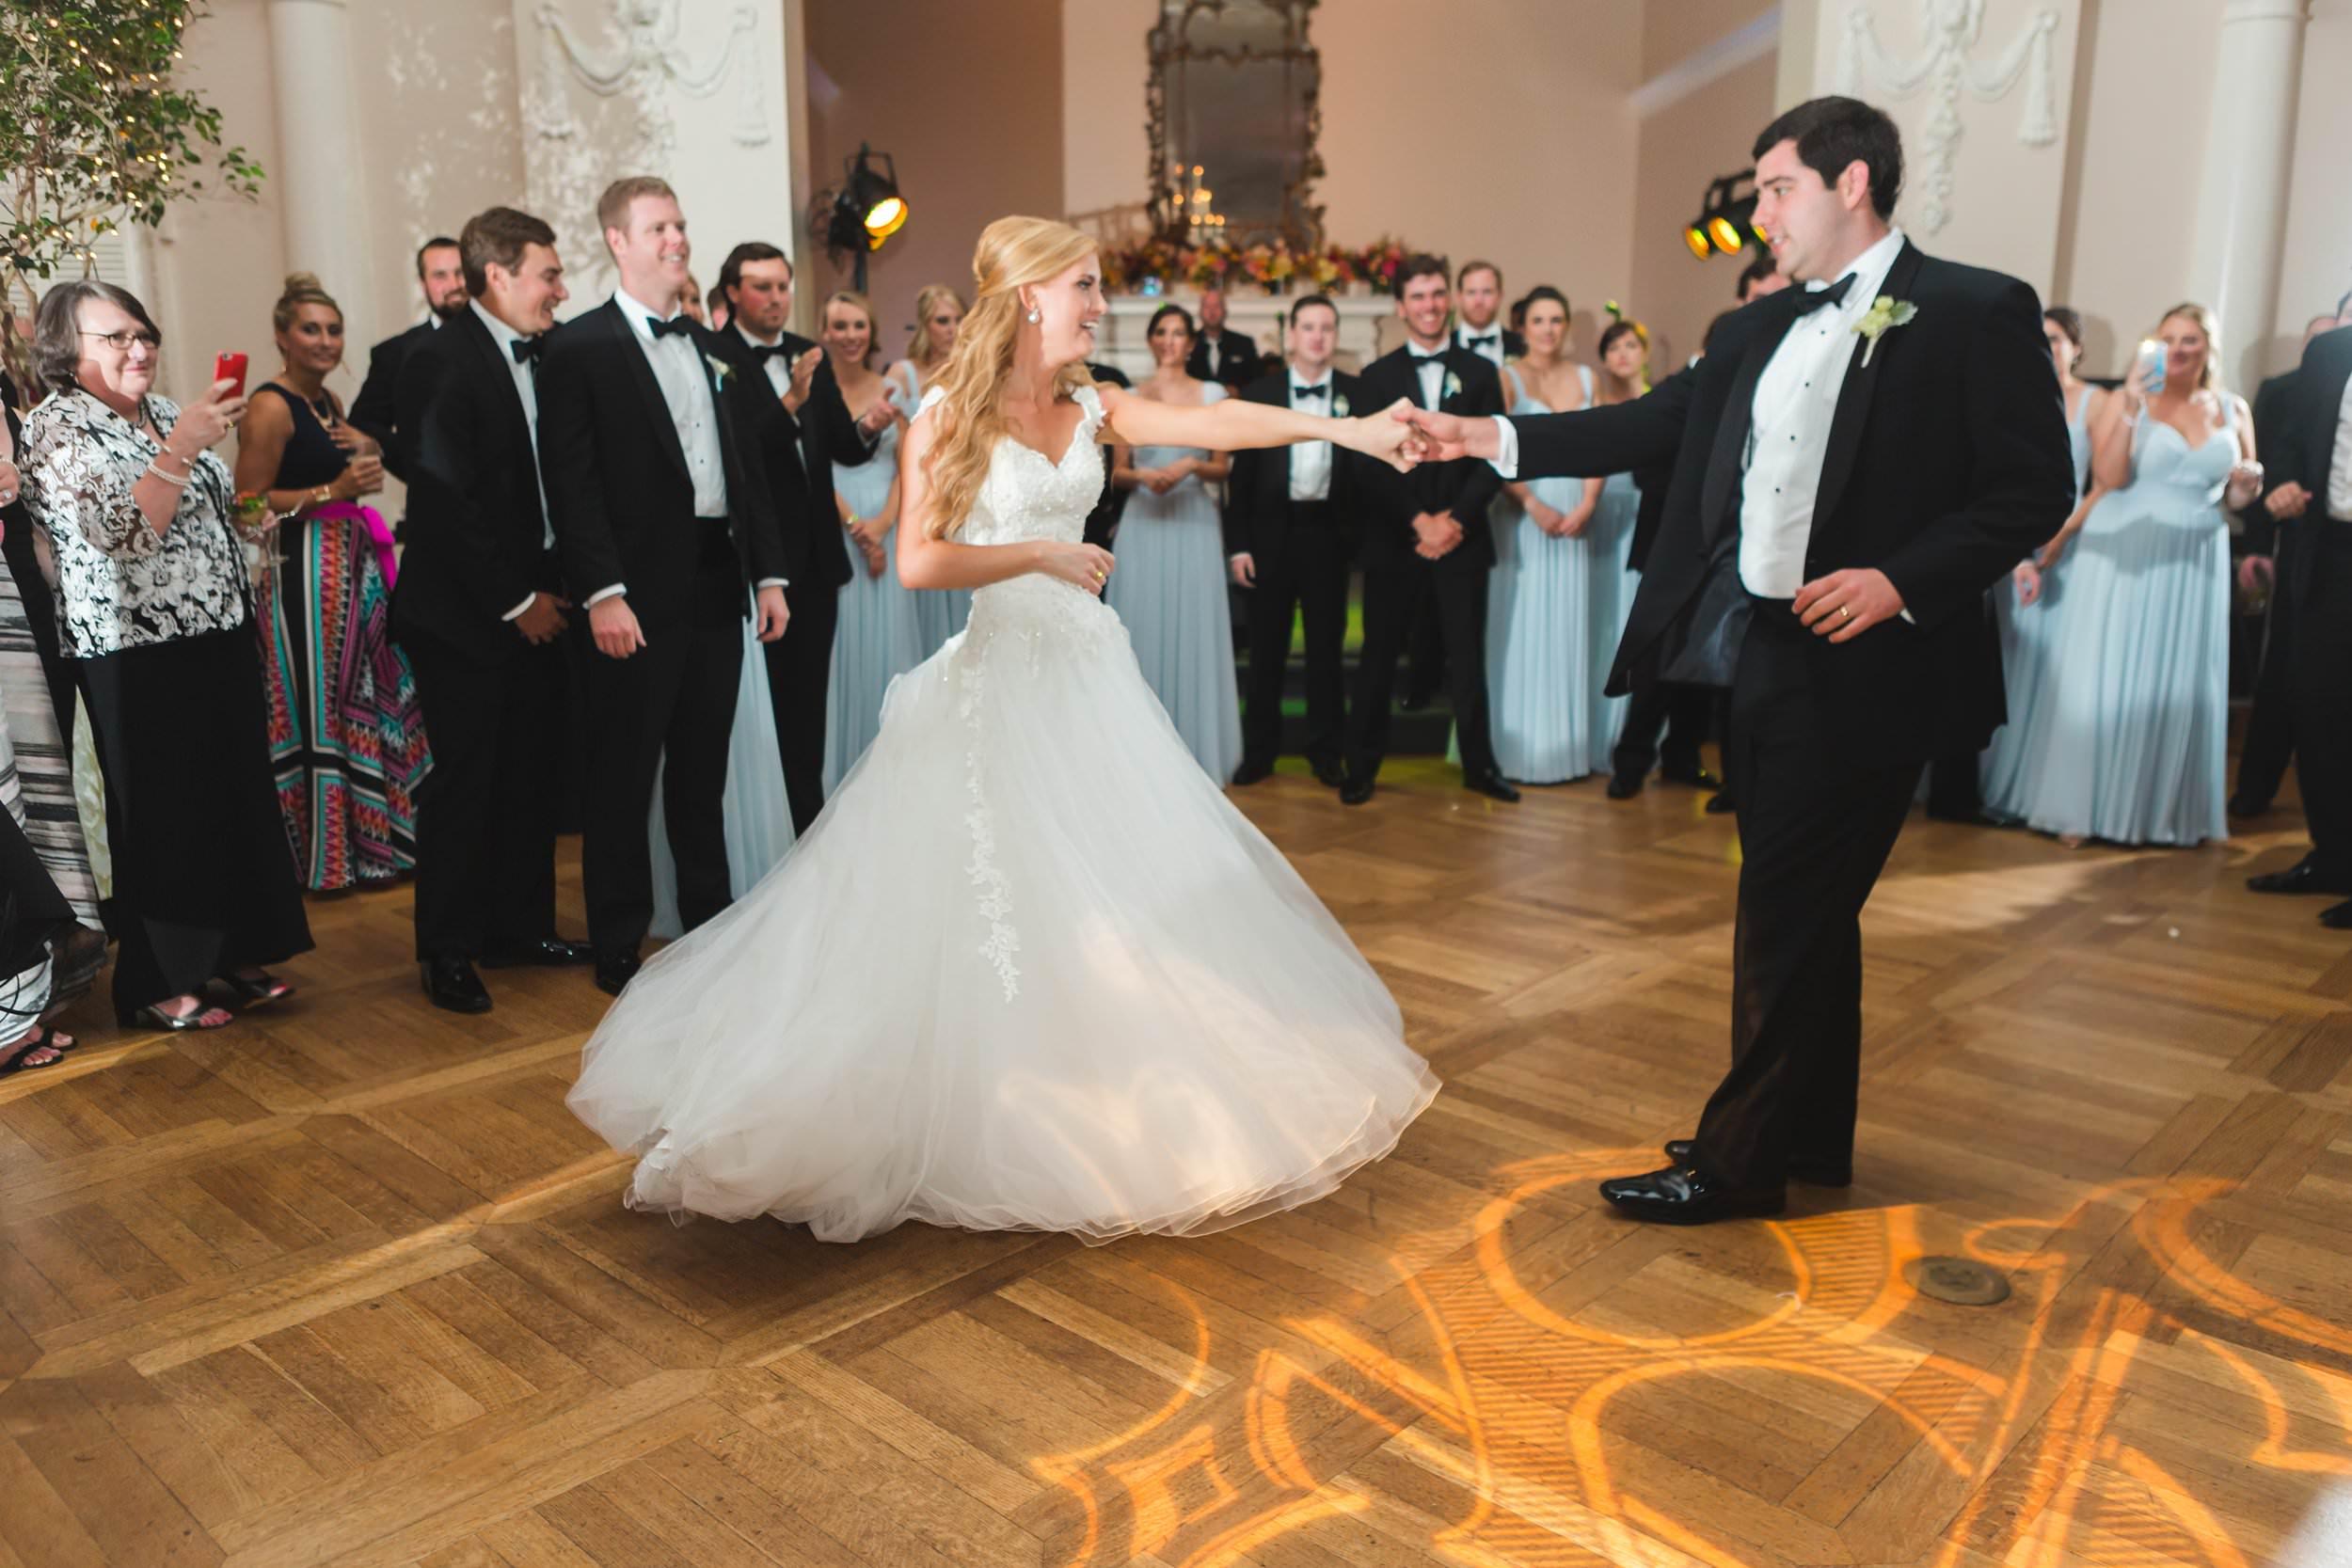 Piedmont-Driving-Club-Wedding-Photos052.jpg